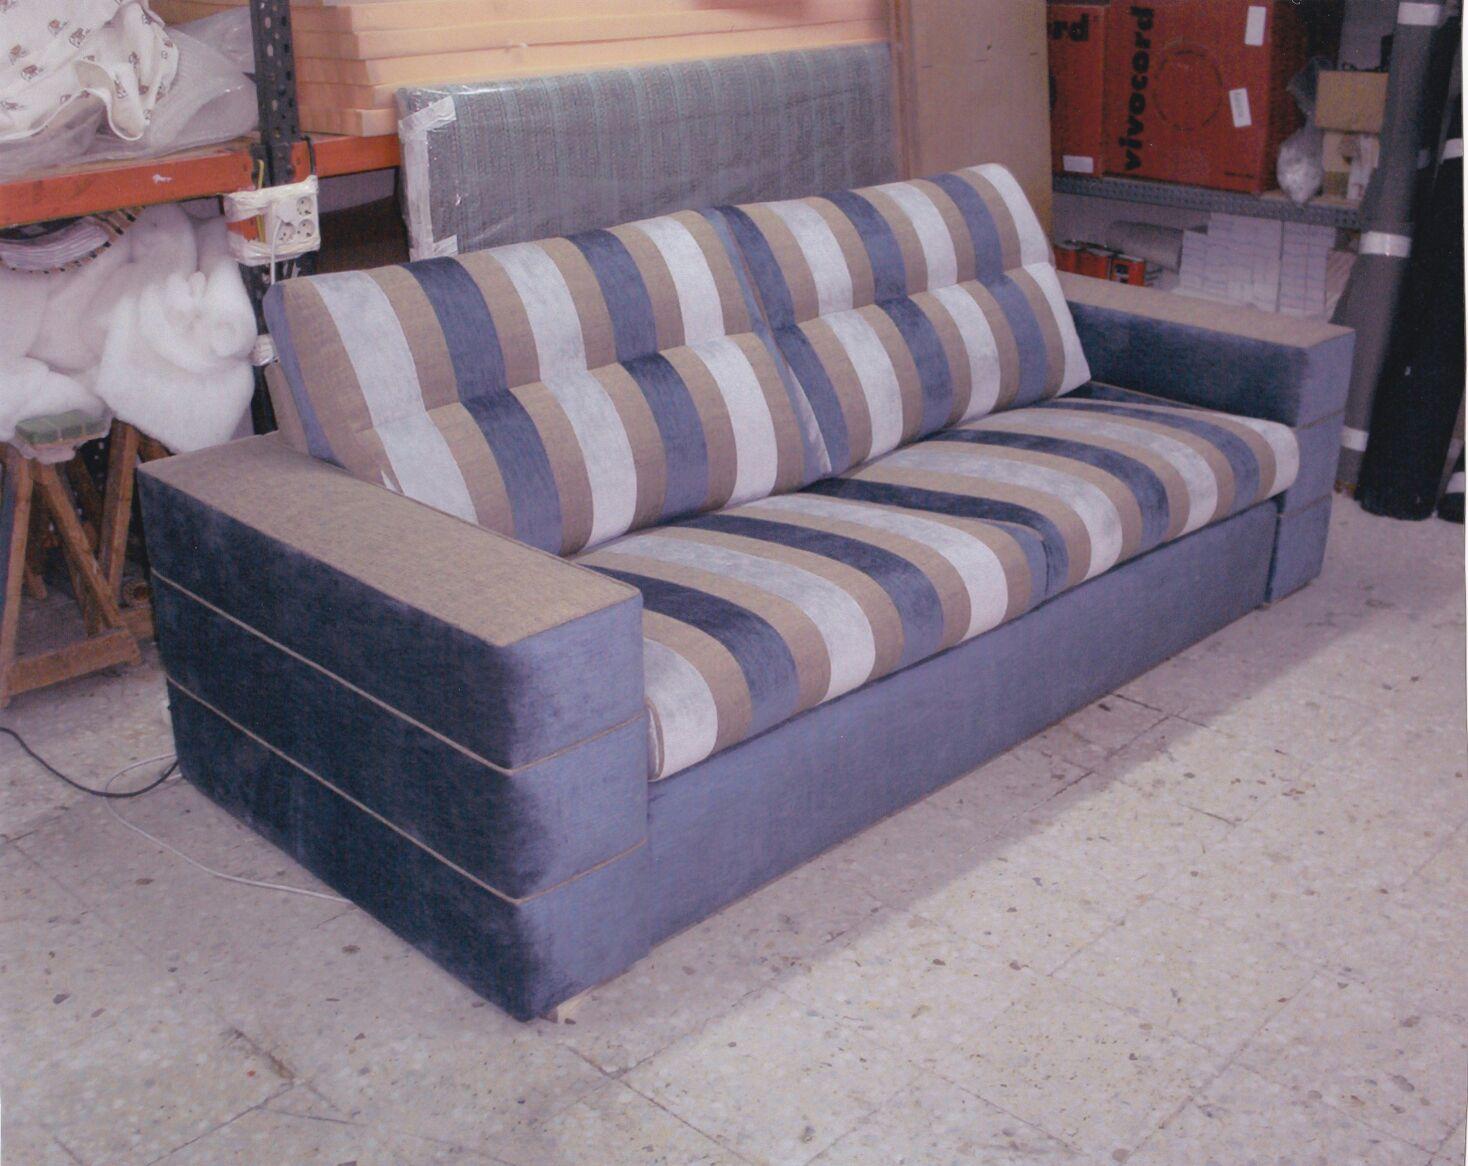 Sofa macao tapizados artesanos tapizados artesanos - Artesanos del sofa ...